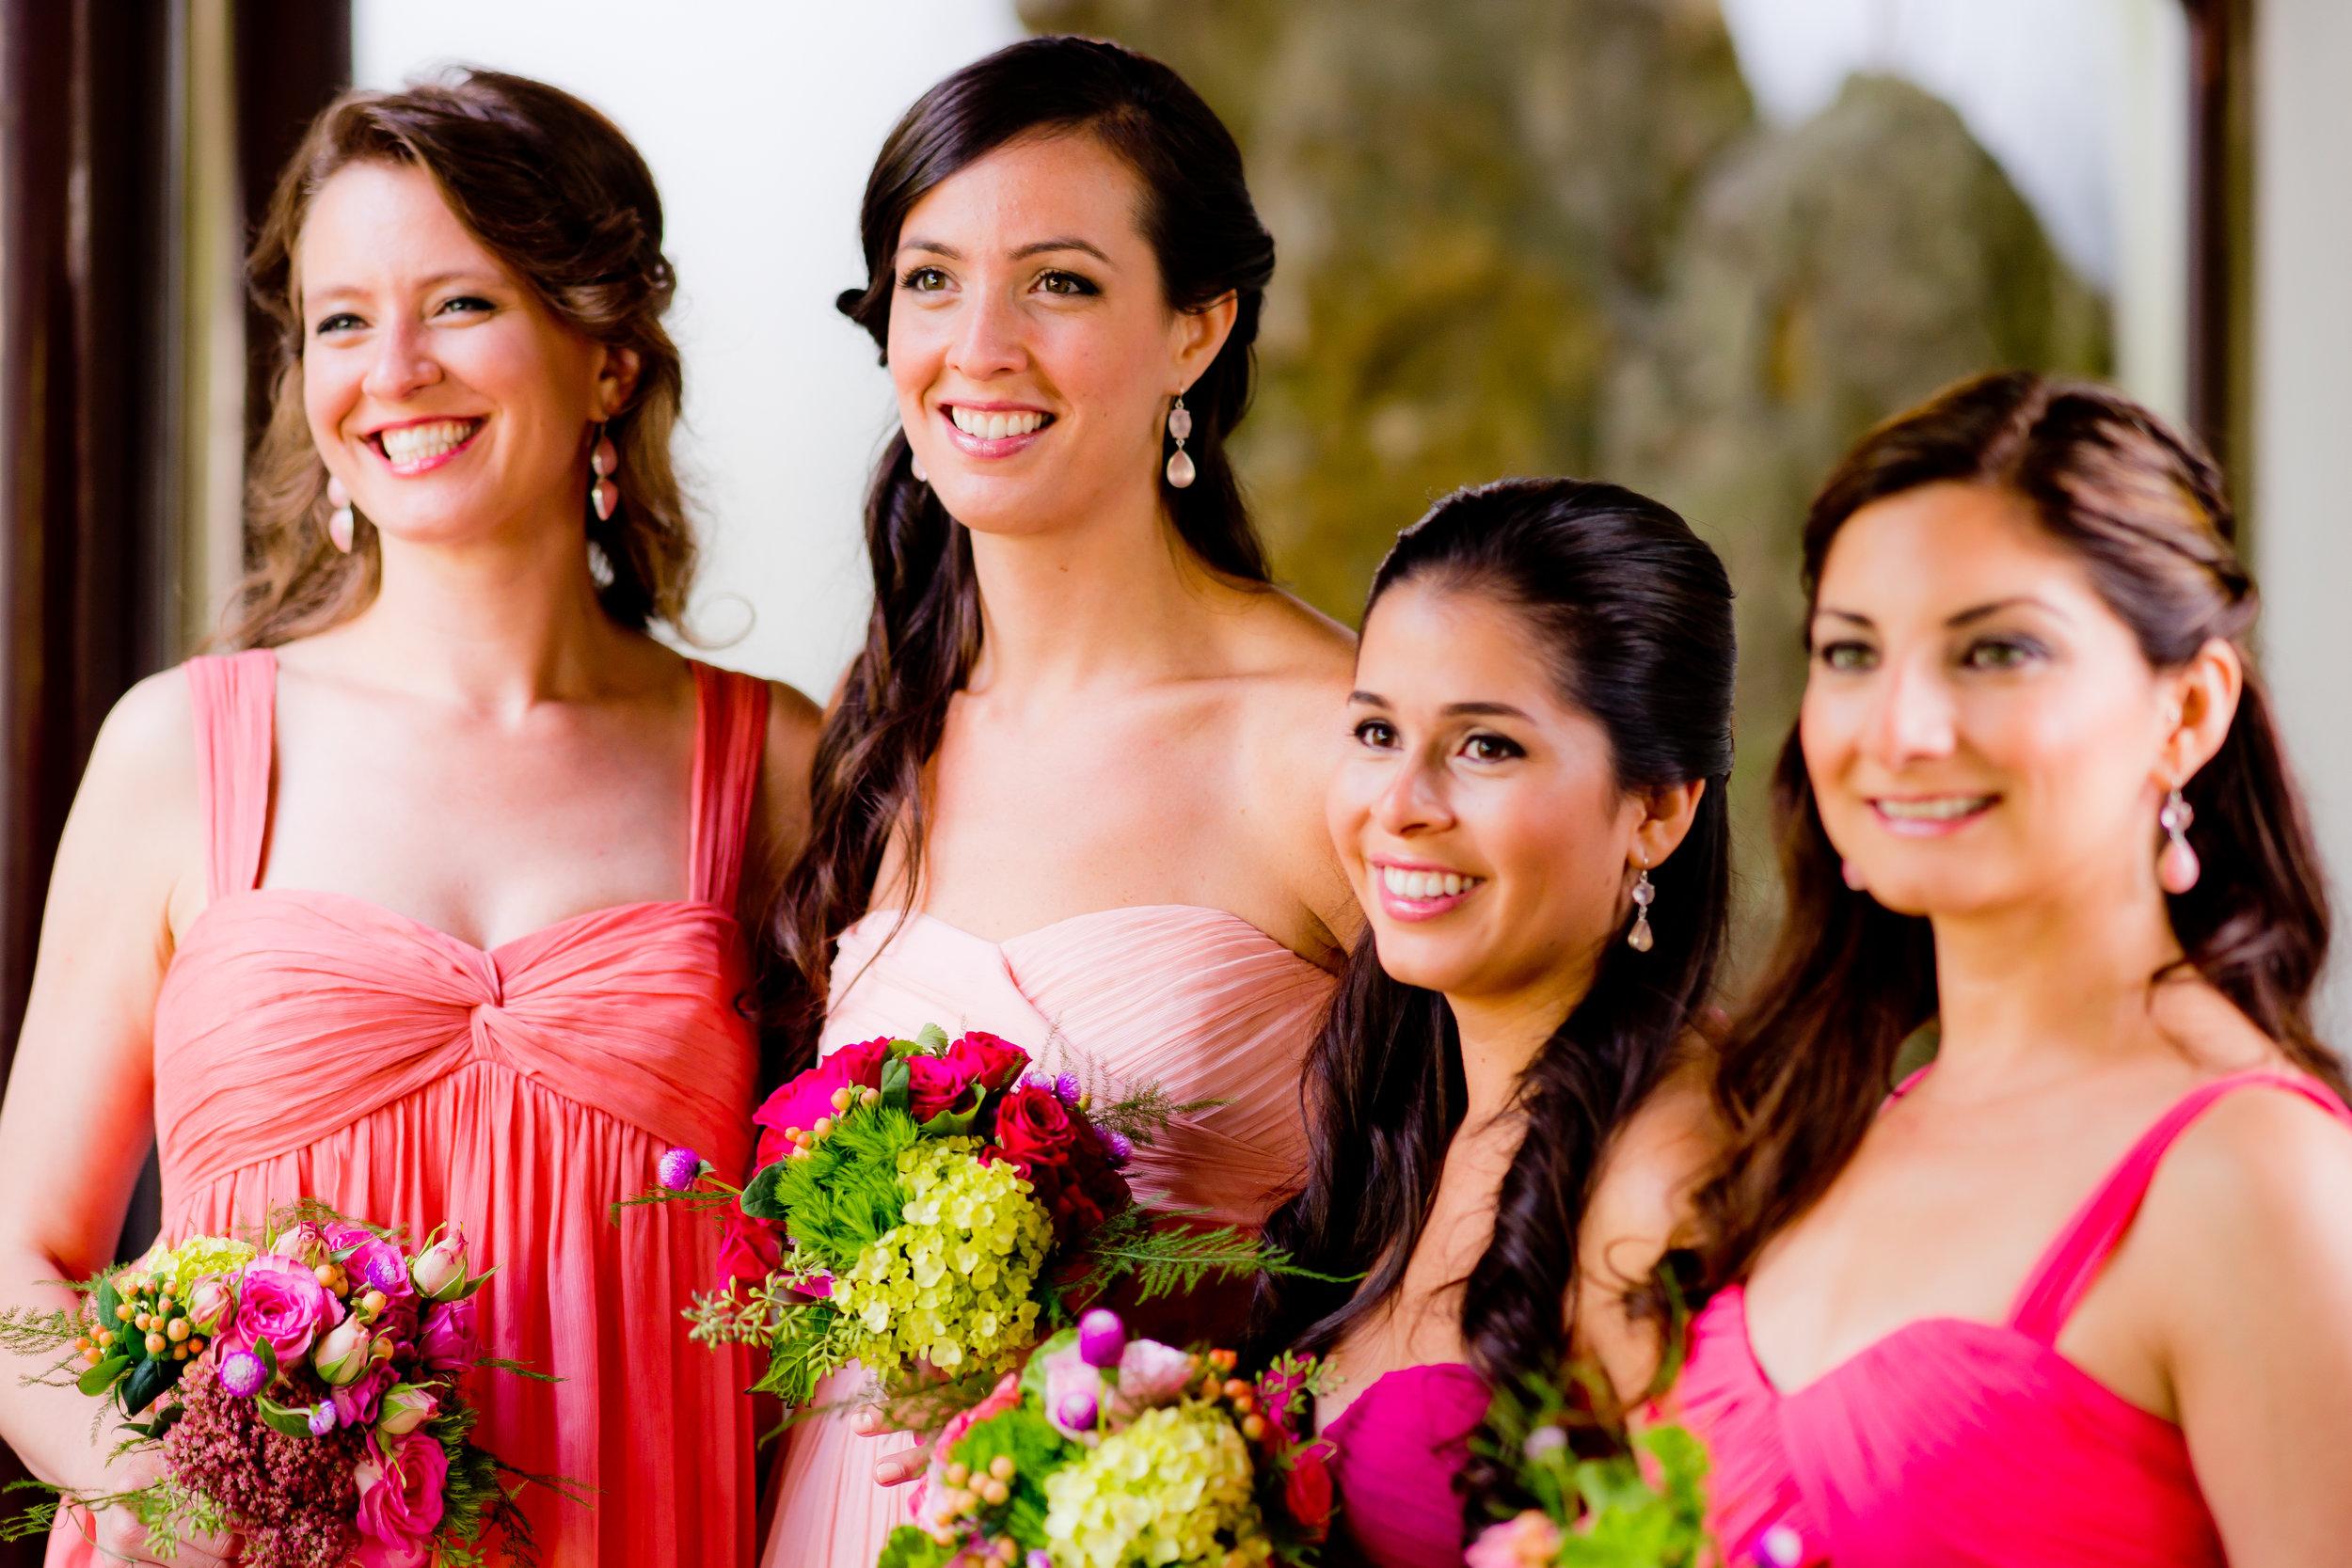 Pink-Ombre-Bridesmaids-Wedding